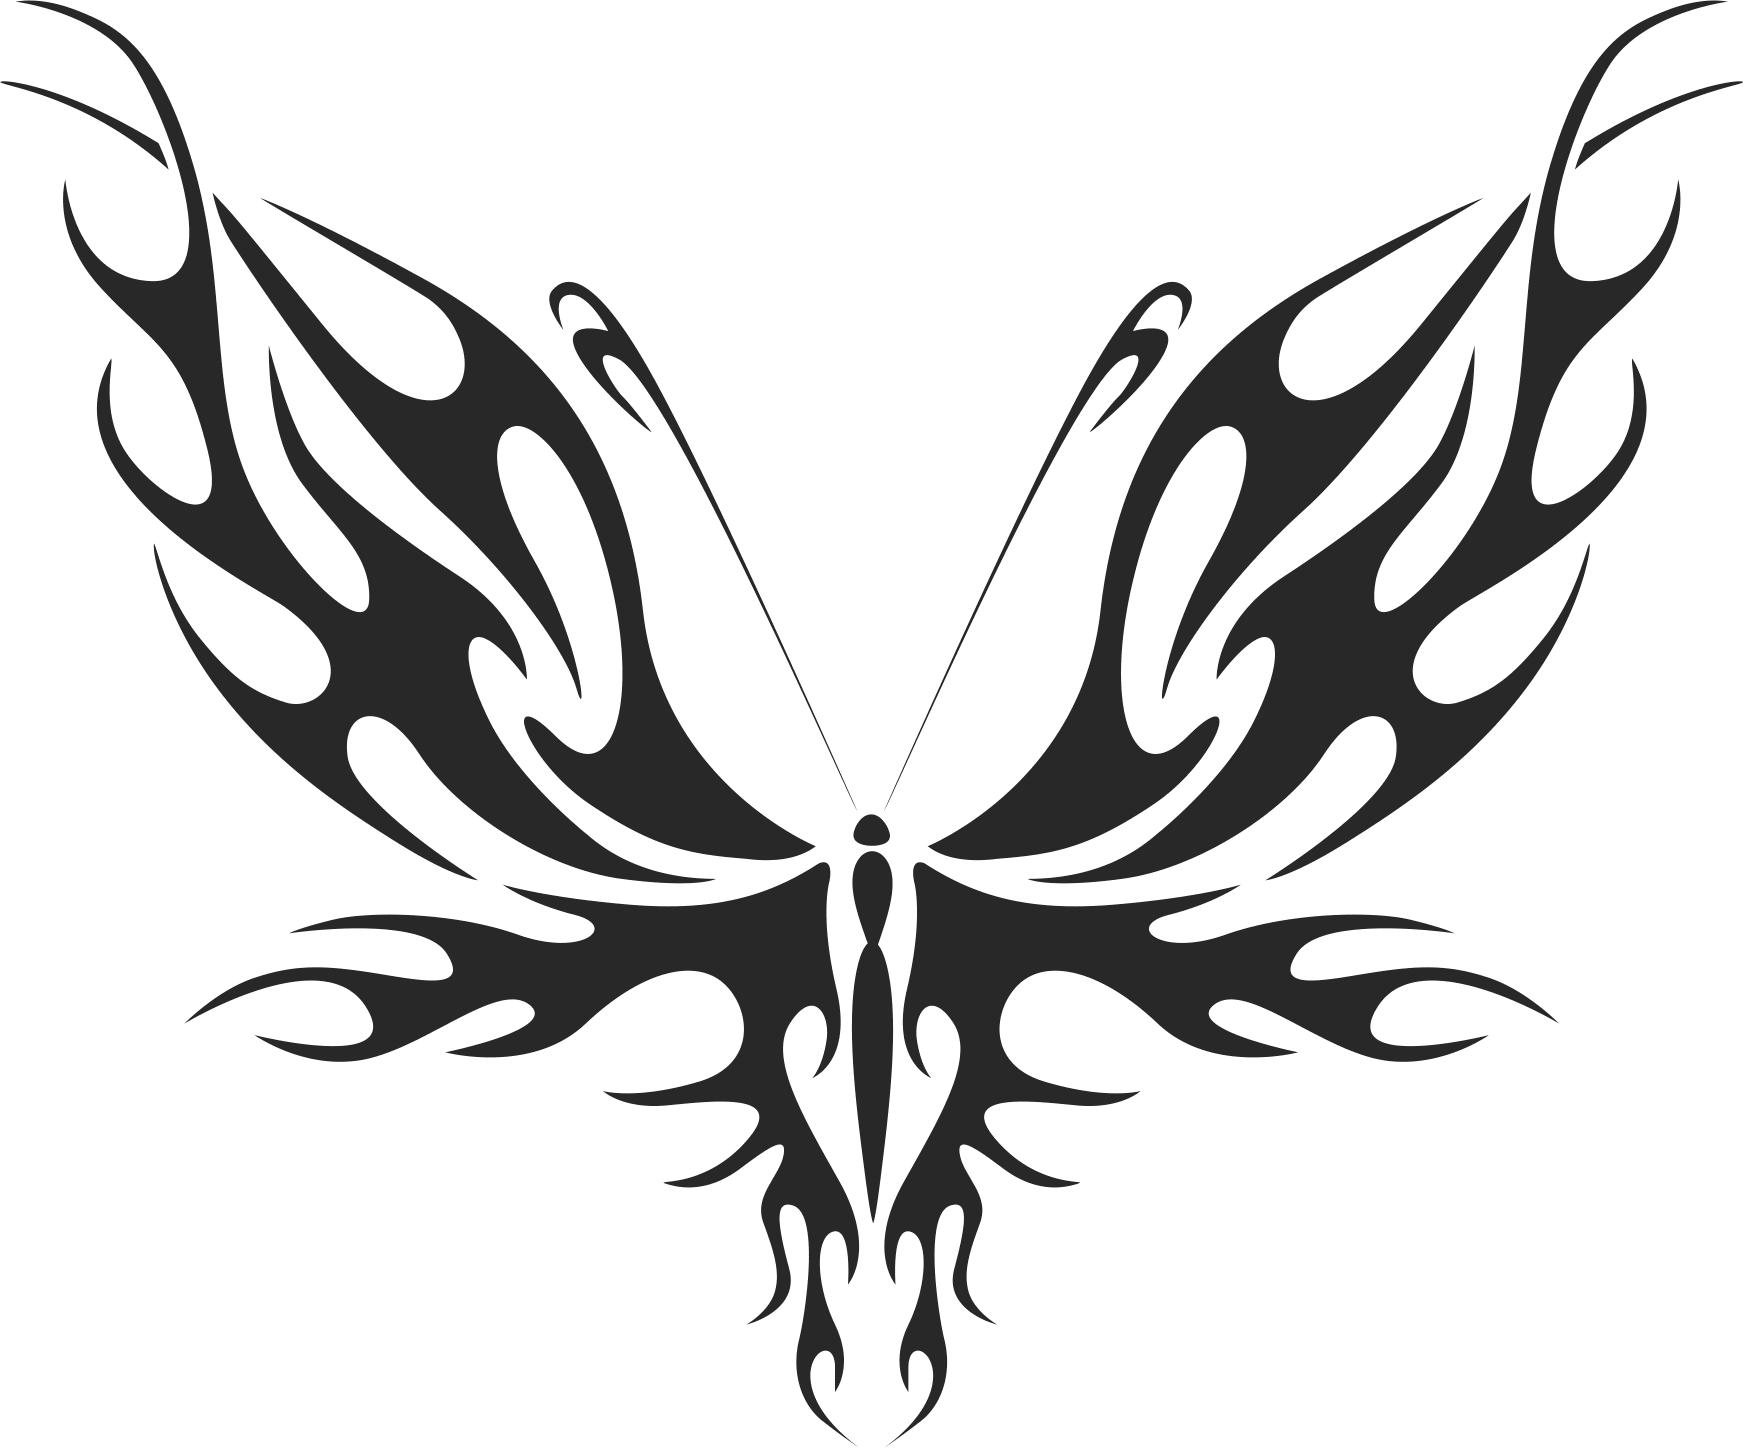 Butterfly Vector Art 031 Free CDR Vectors Art